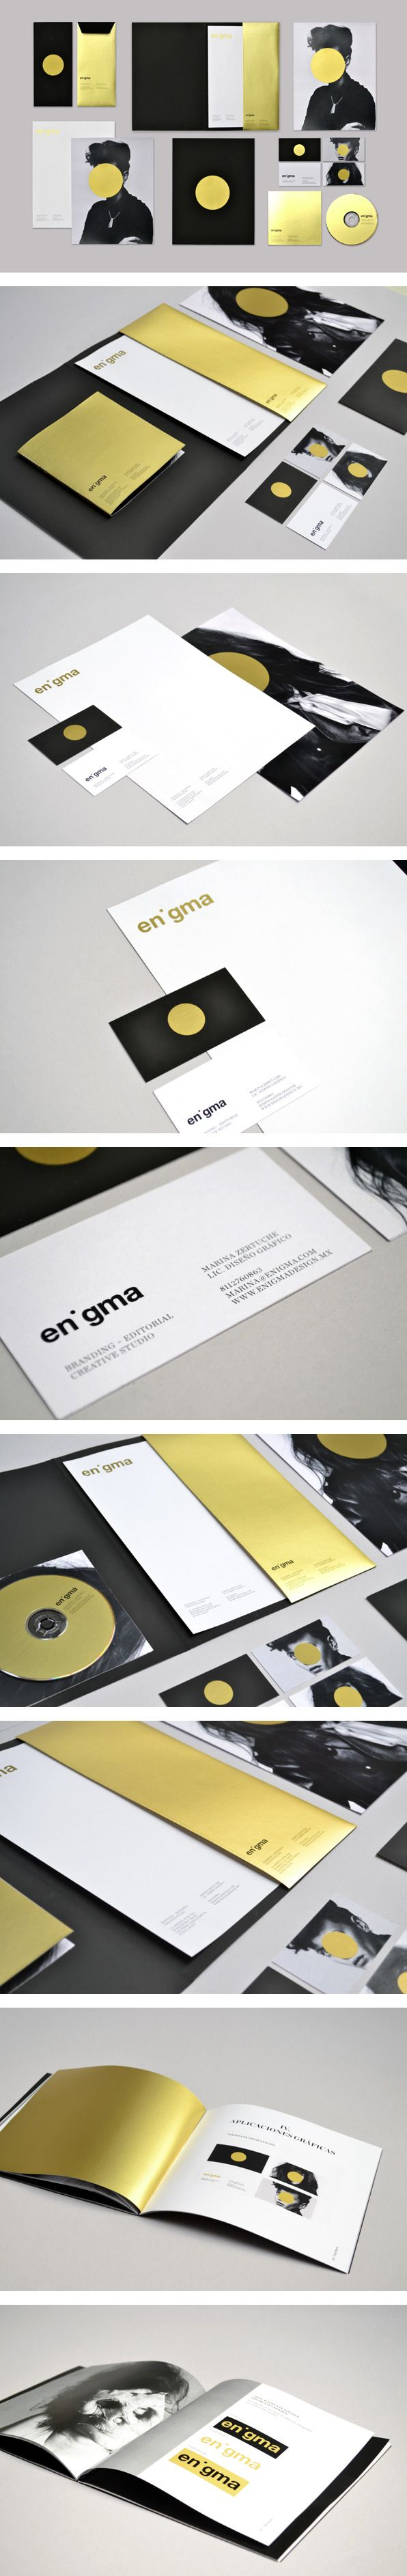 Enigma Personal Identity by Marina Zertuche